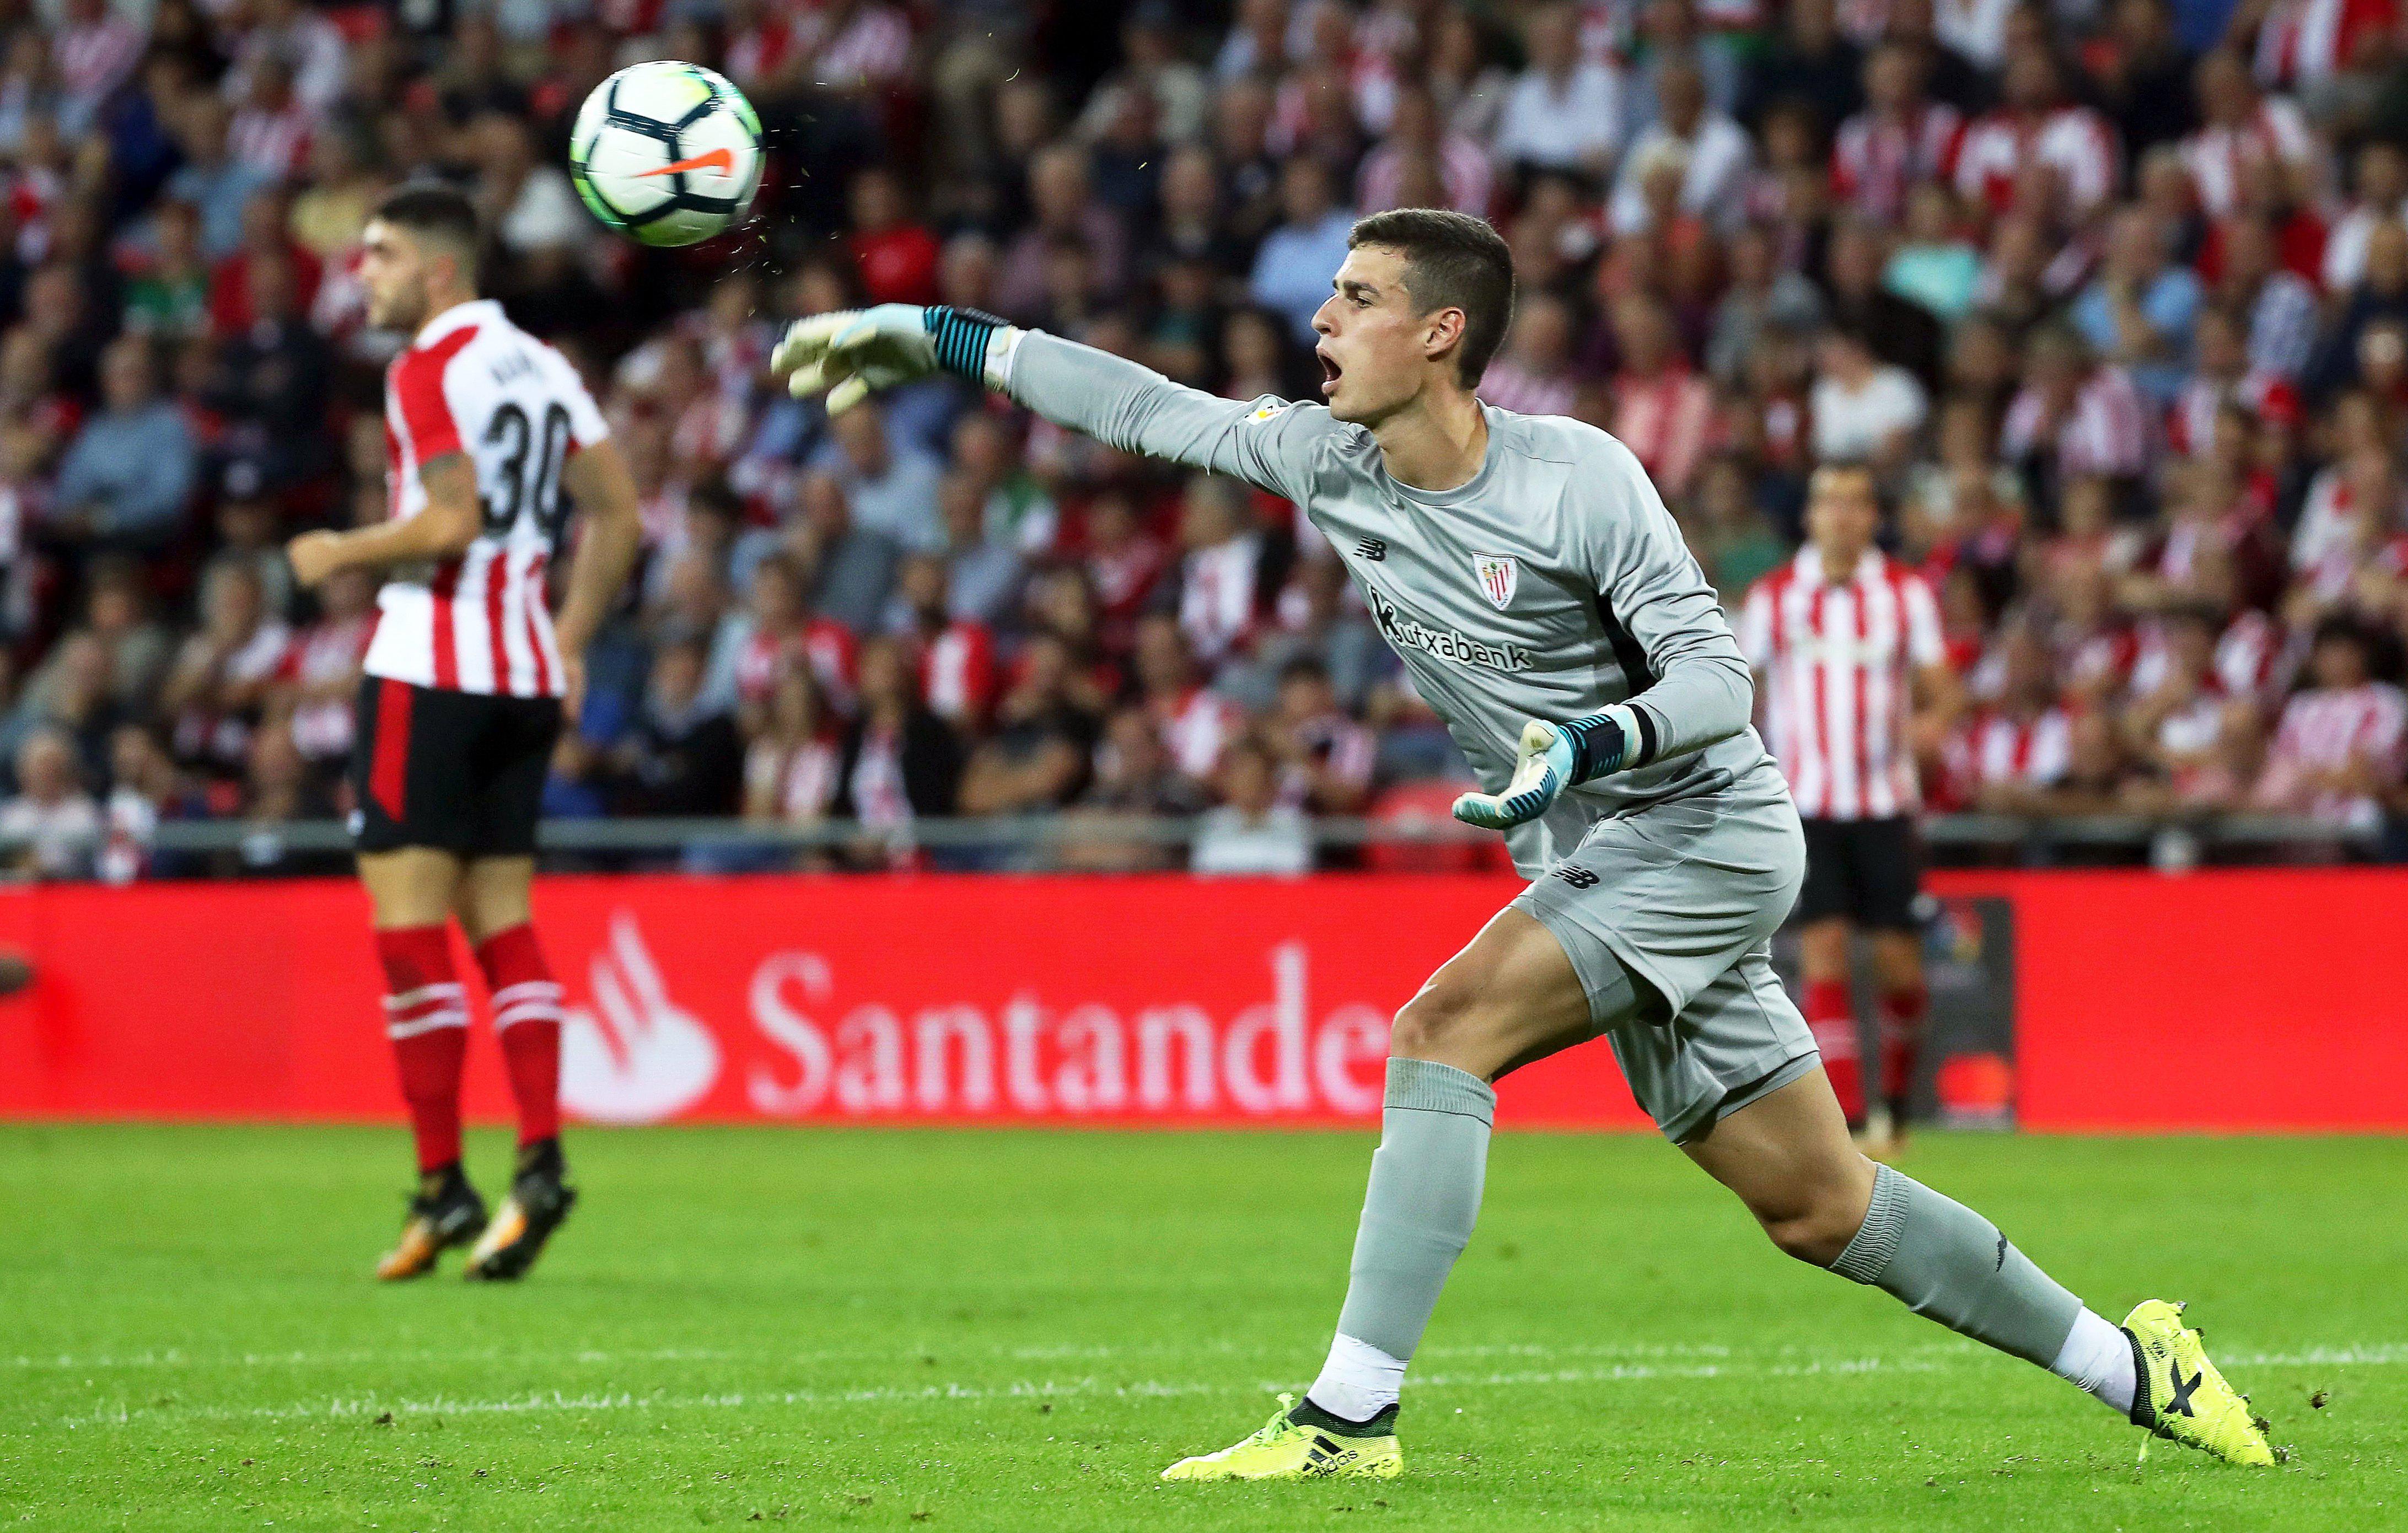 Arrizabalaga is touted as future Spain No 1